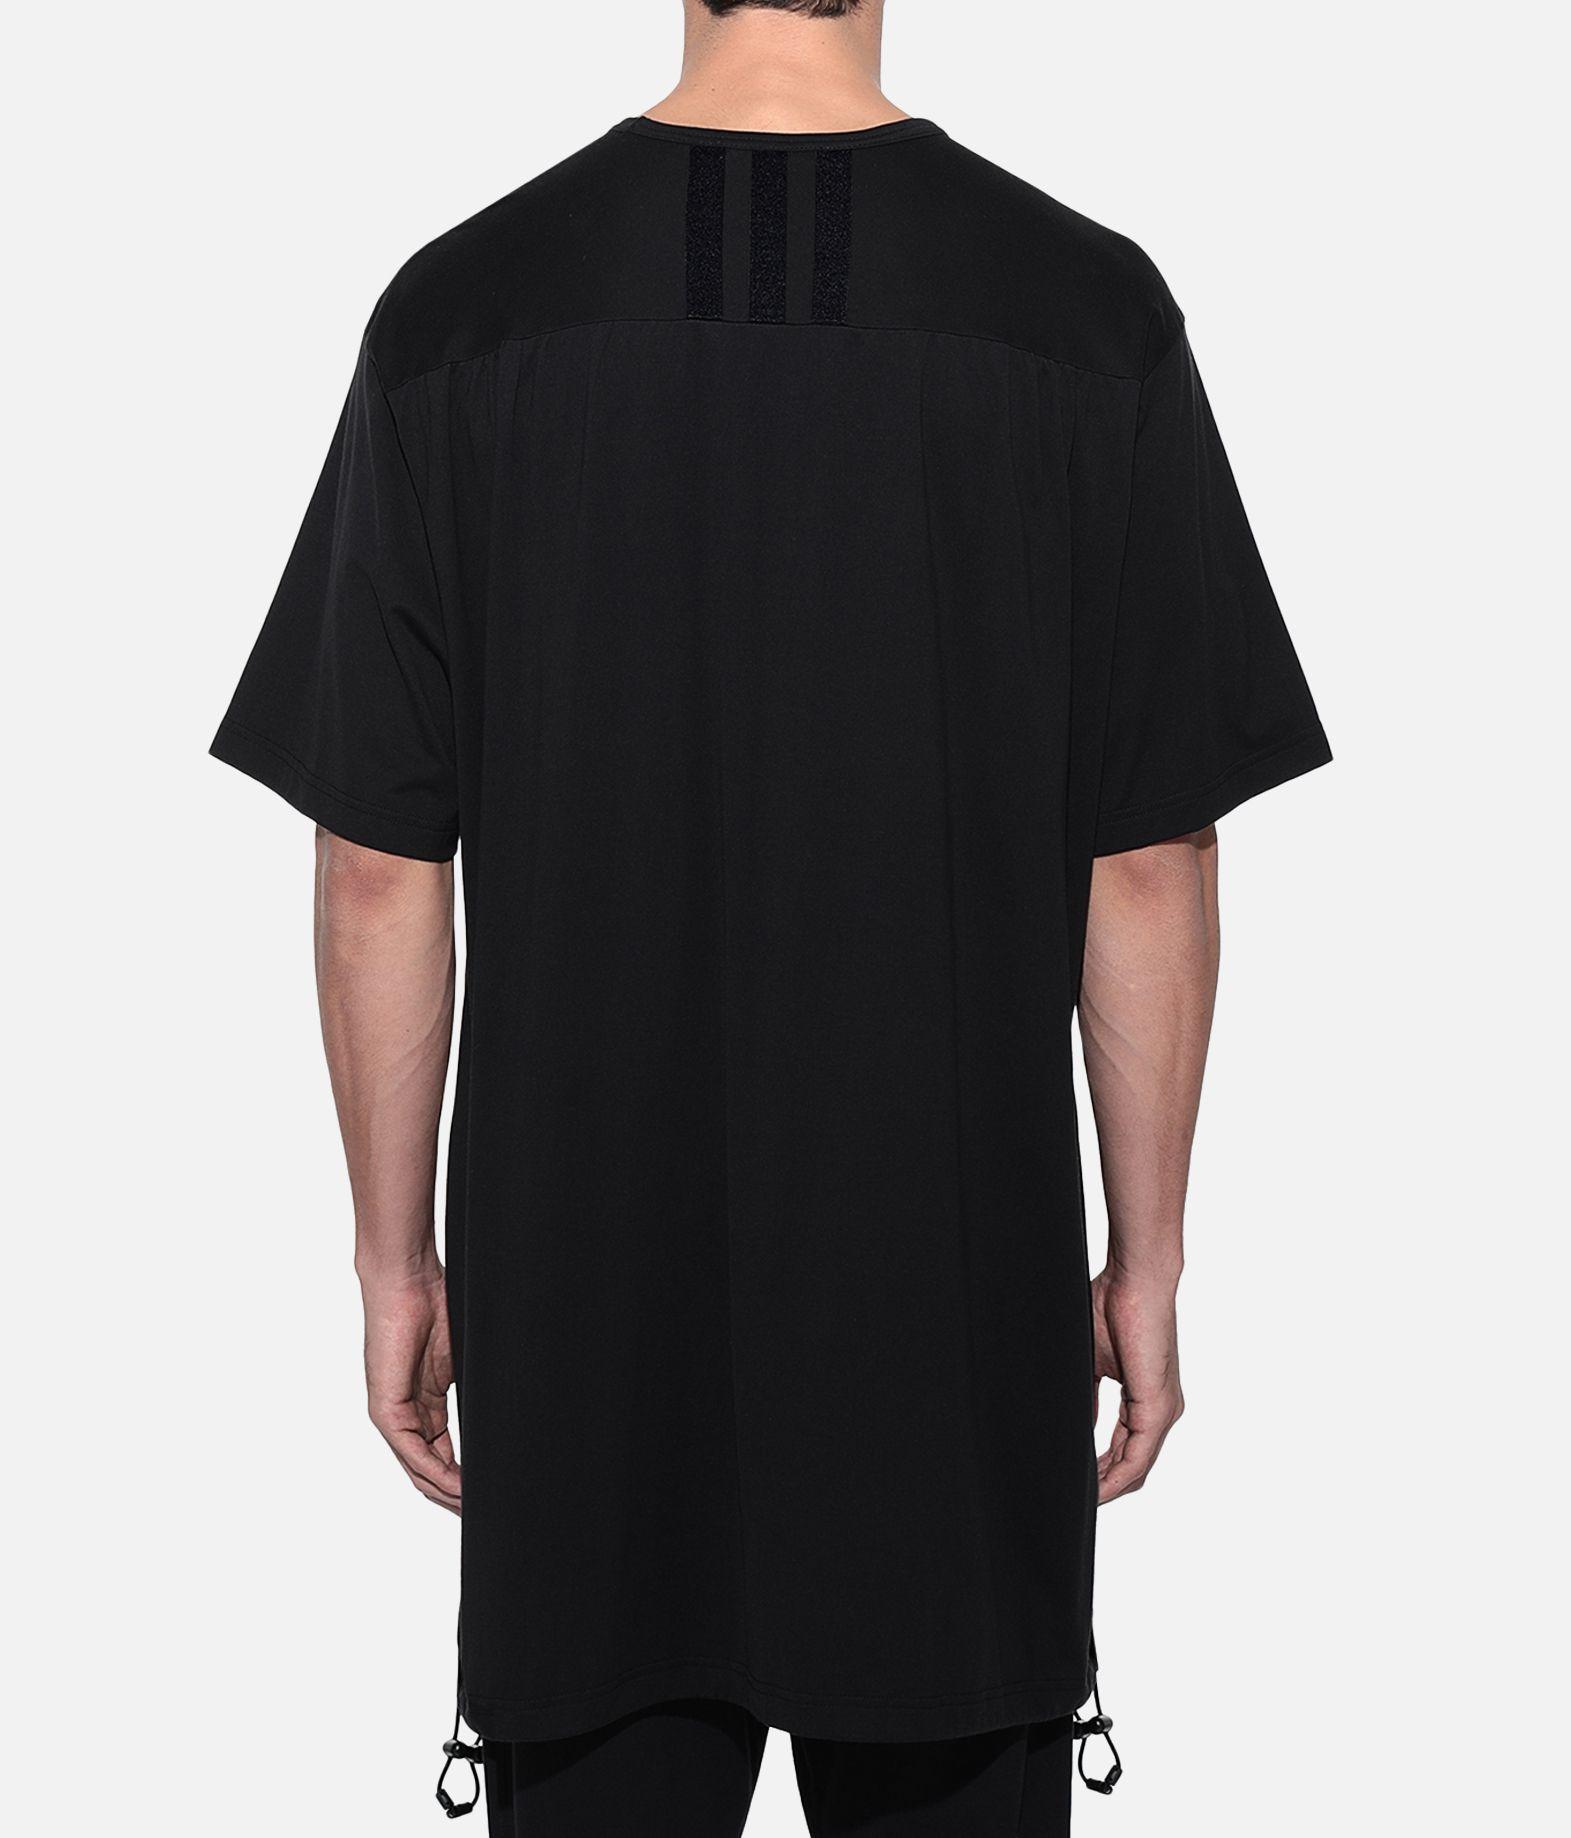 Y-3 Y-3 Drawstring Long Tee  Kurzärmliges T-shirt Herren d